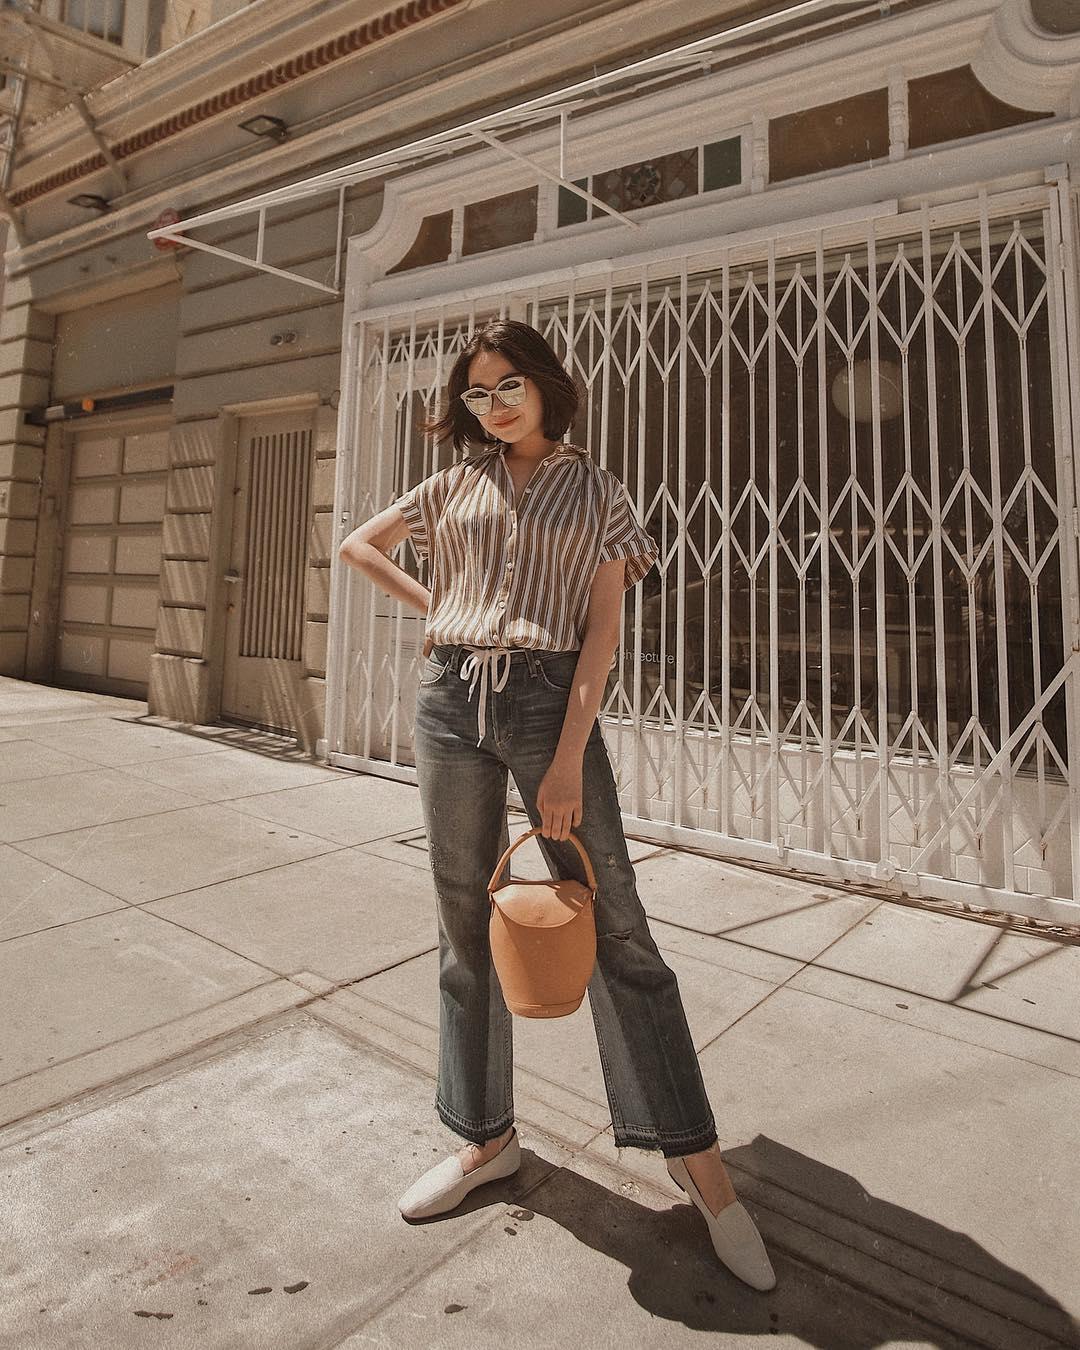 @Vivid Outfit ideas